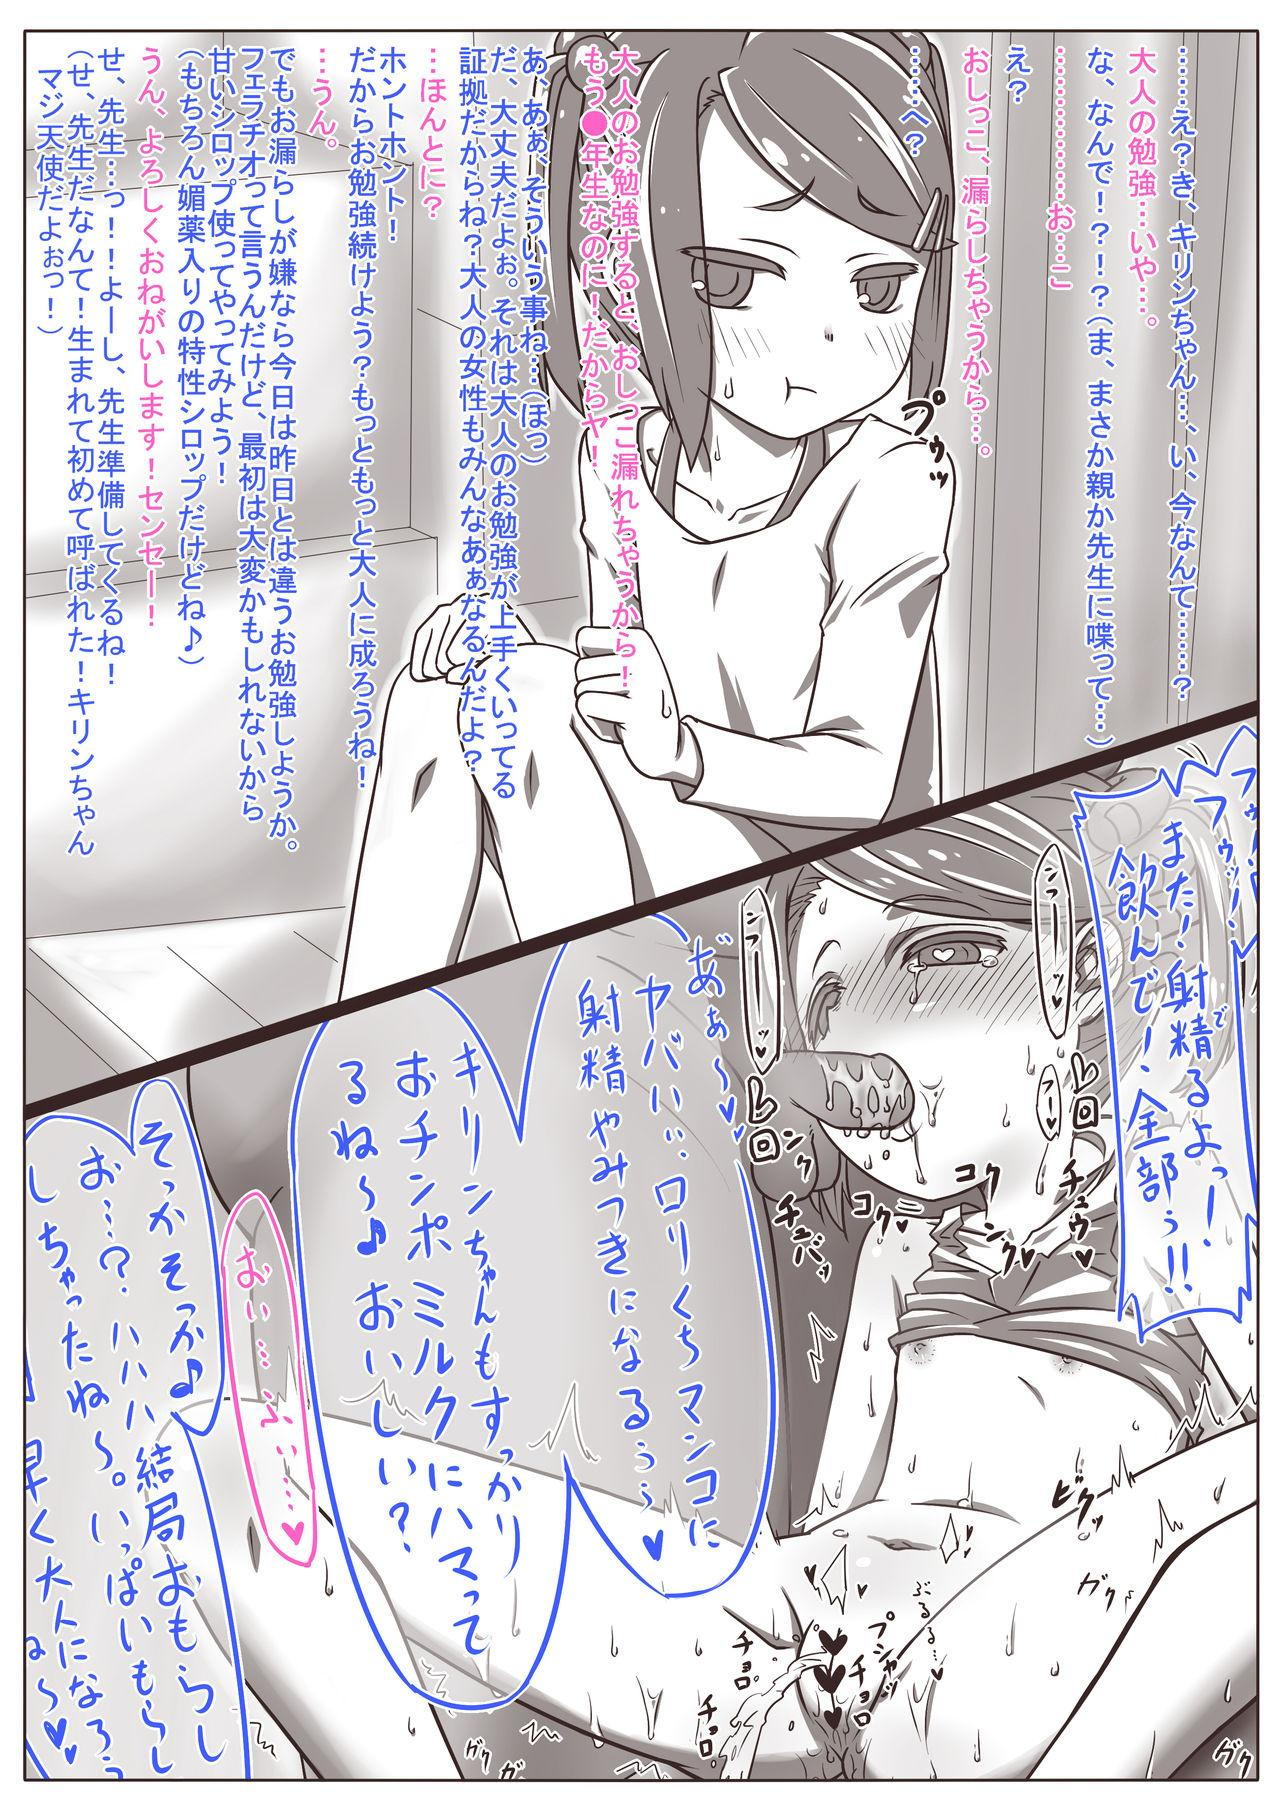 Hitozuma Kirika 122